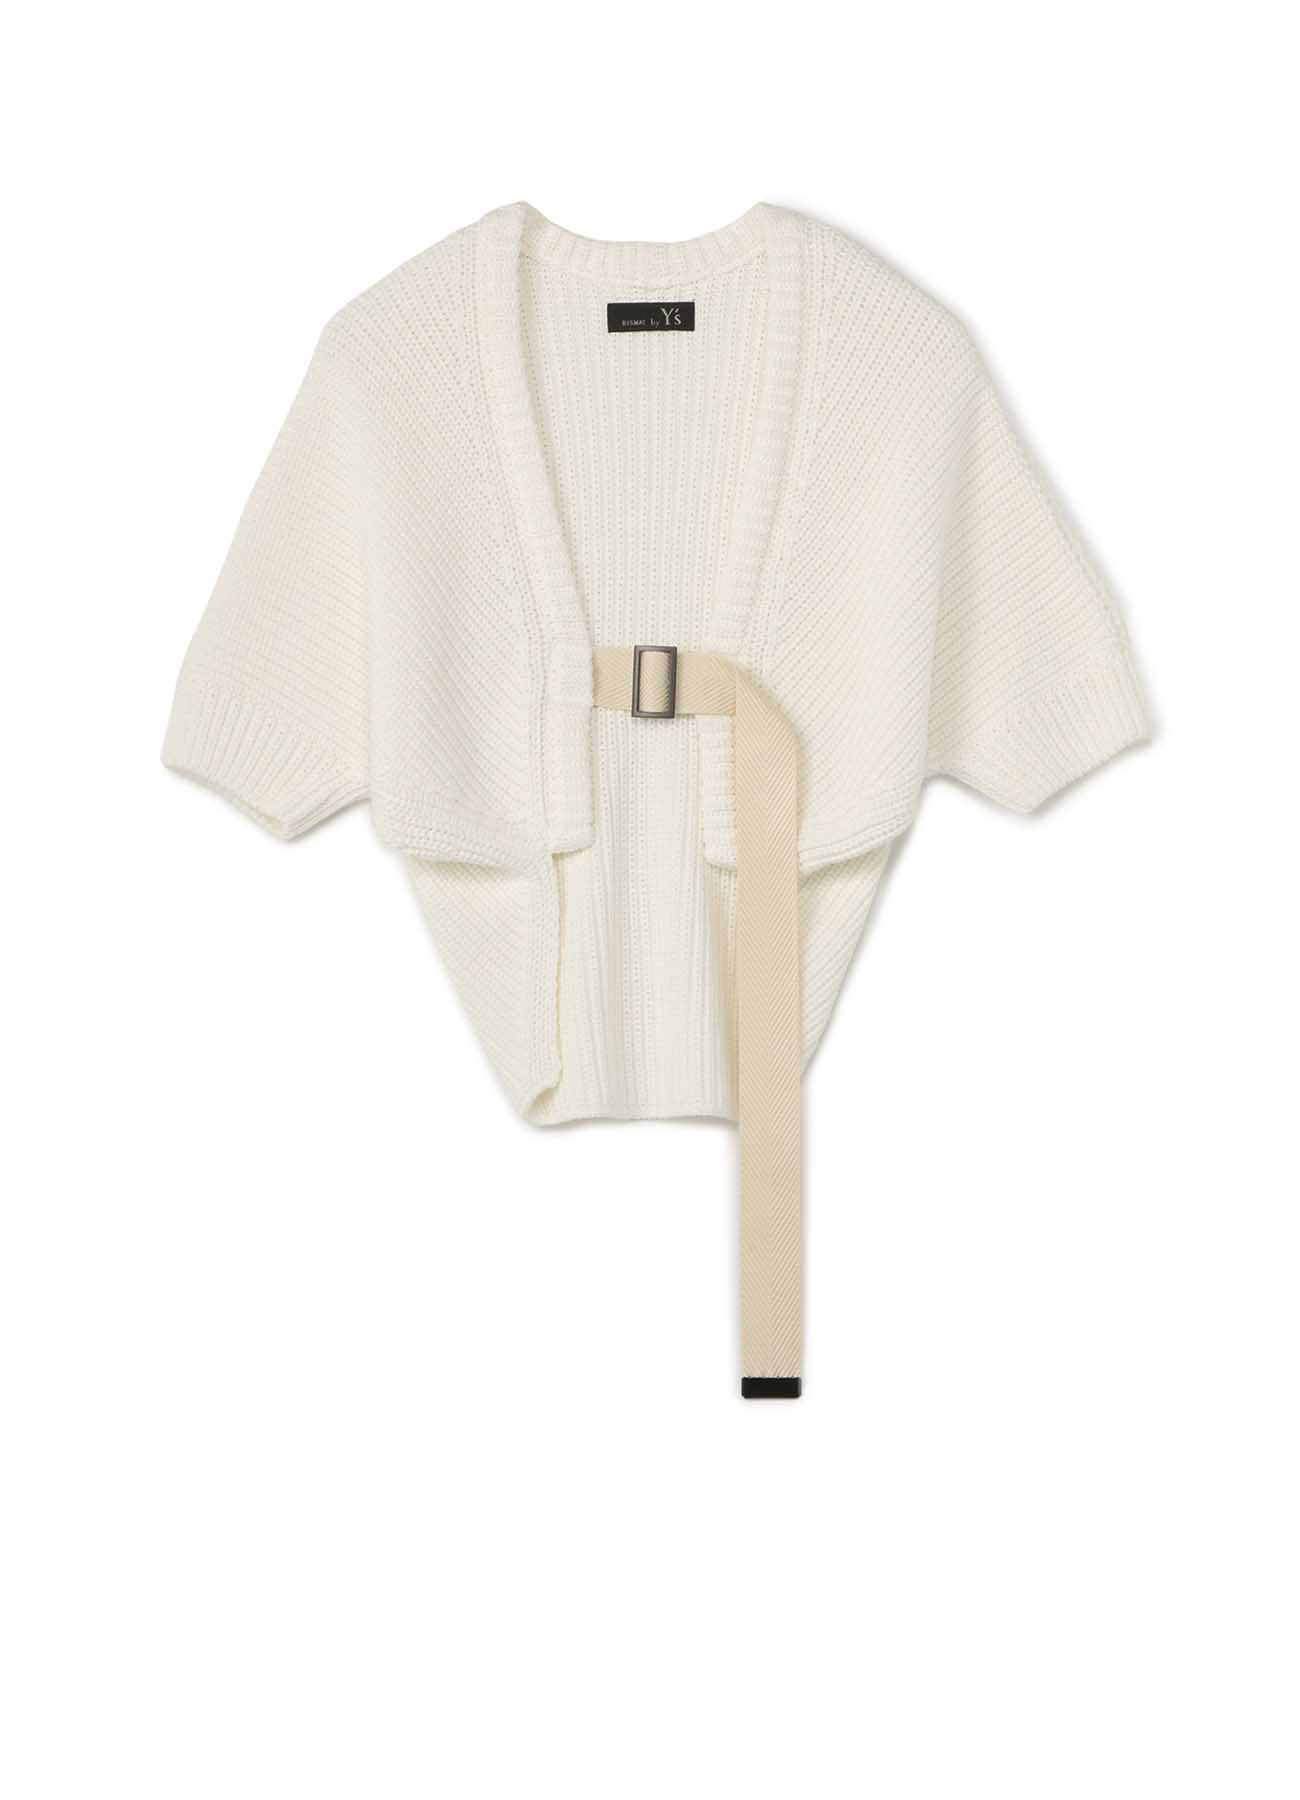 RISMATbyY的棉质单排编织皮带腰带短袖haori